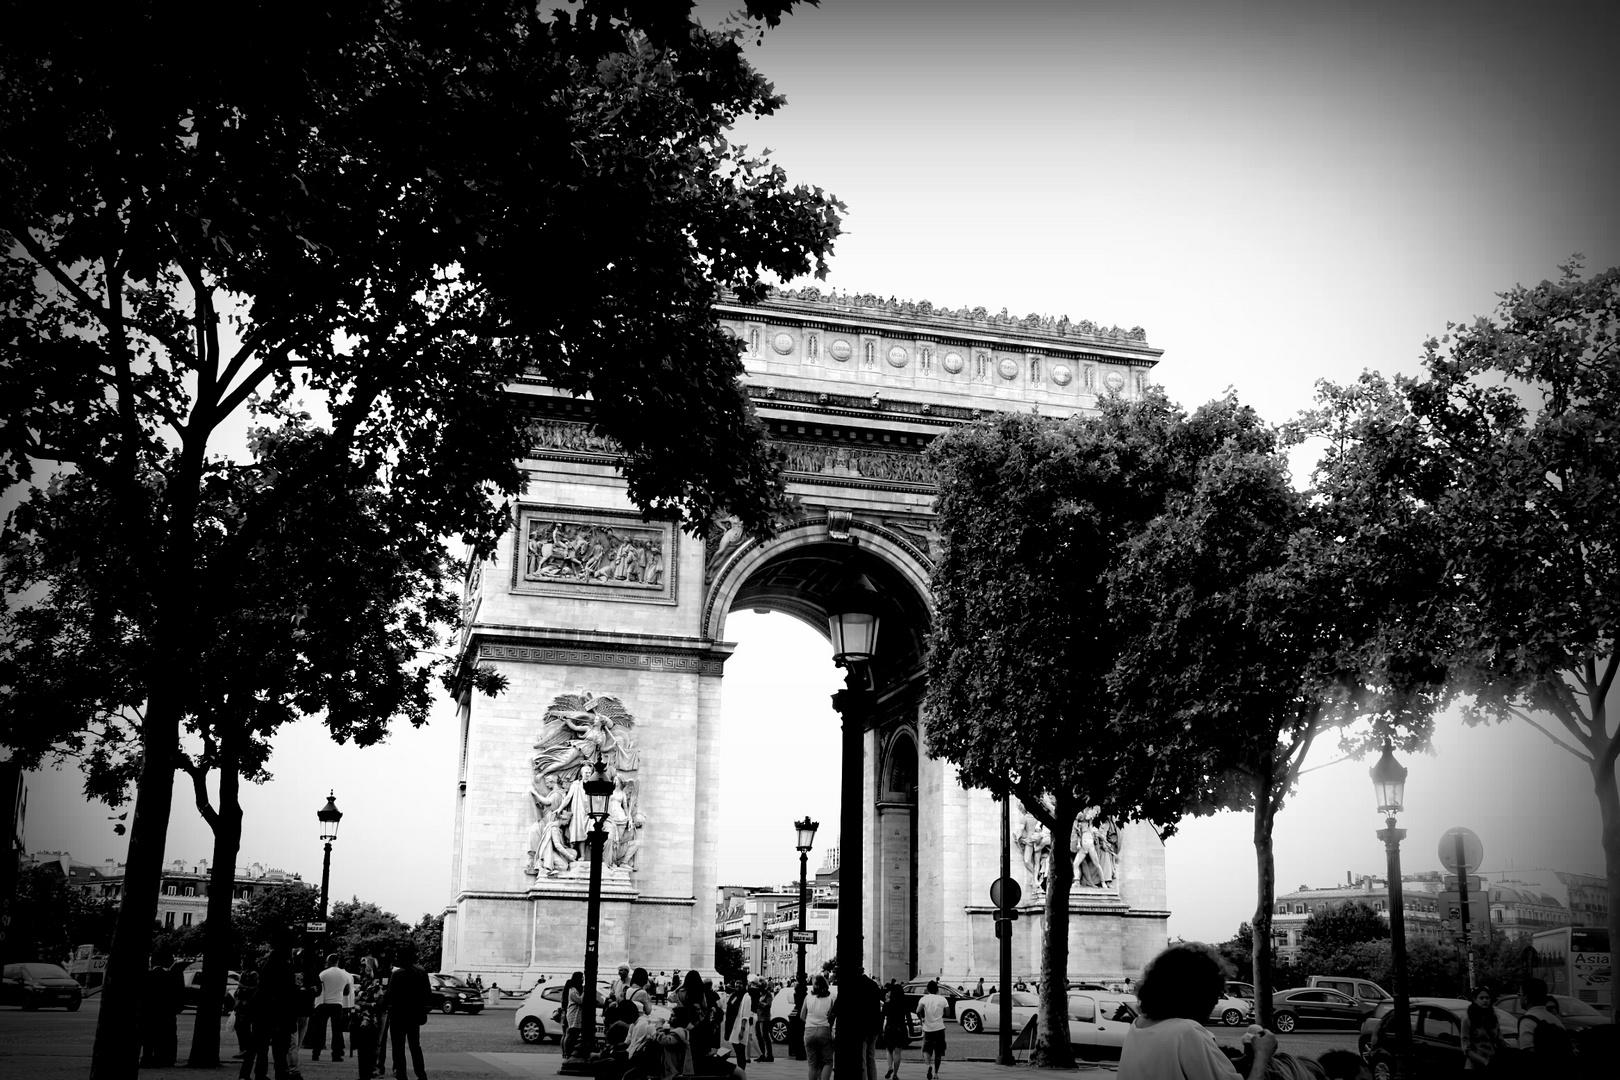 Arc du Triomph #2